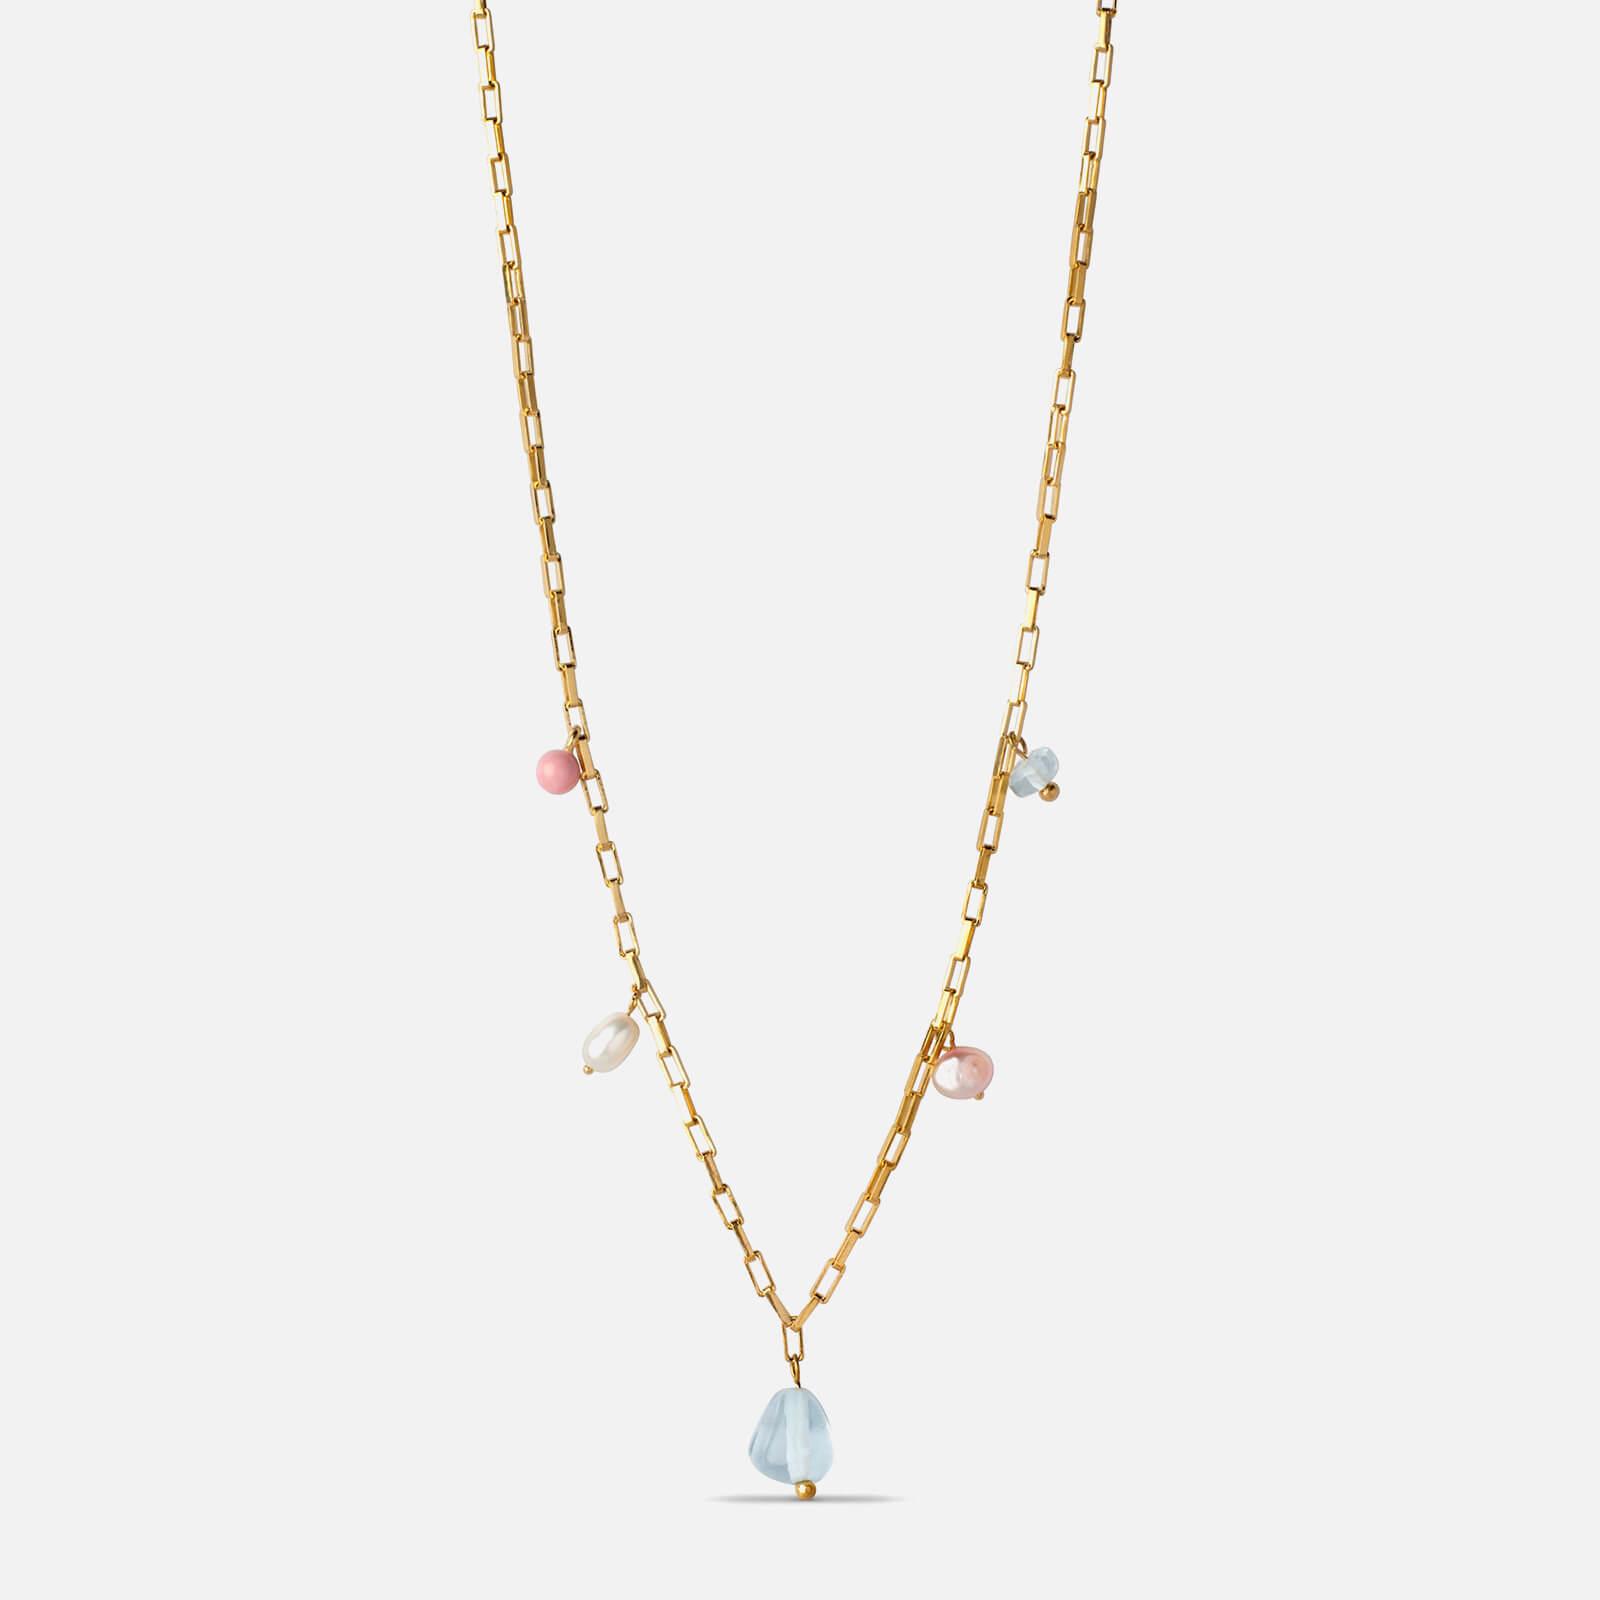 ENAMEL Copenhagen Women's Mellow Necklace - Blue